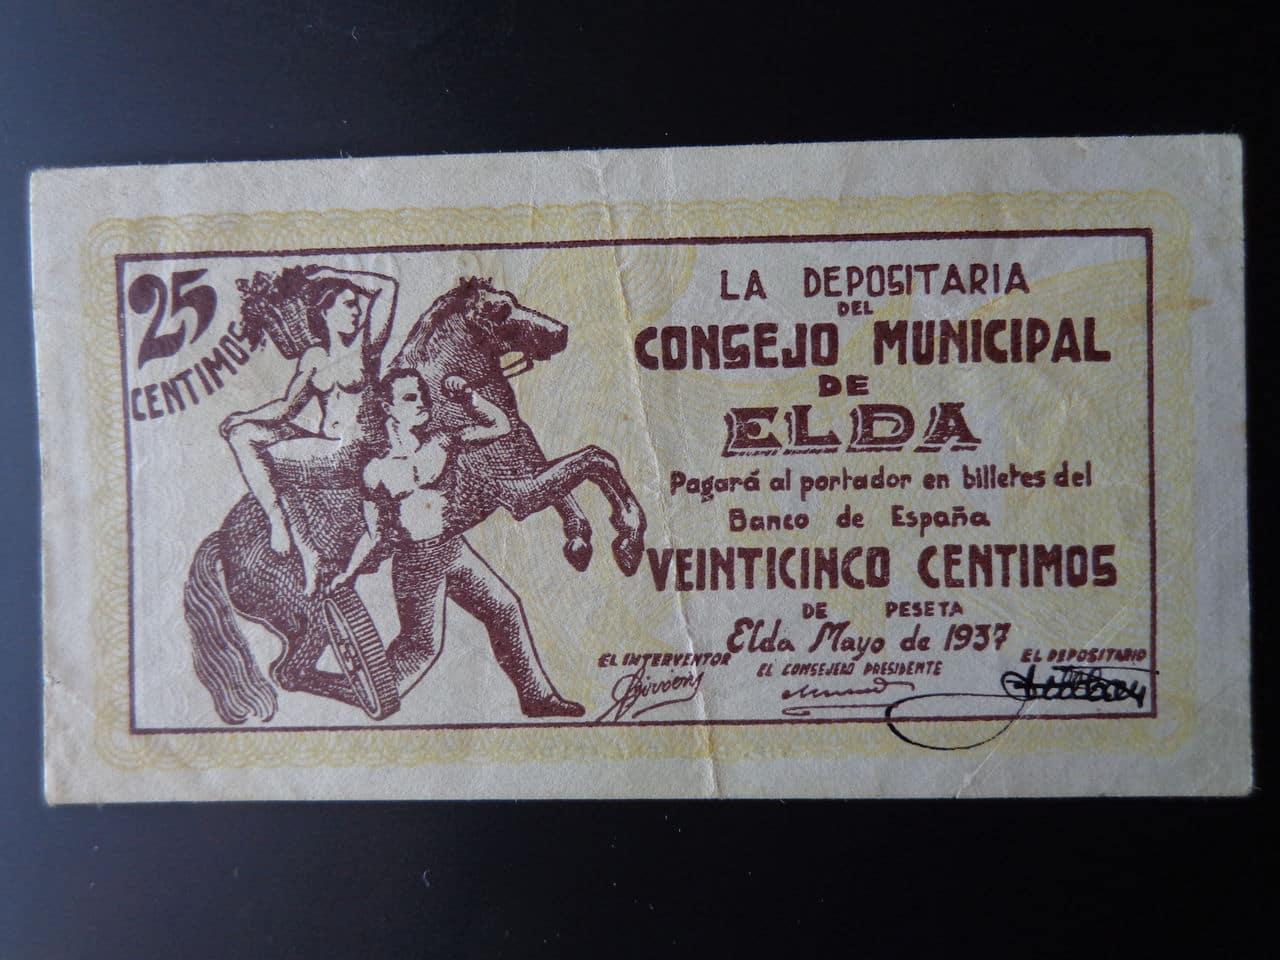 25 Centimos Elda 1937 (Alicante) DSC00366